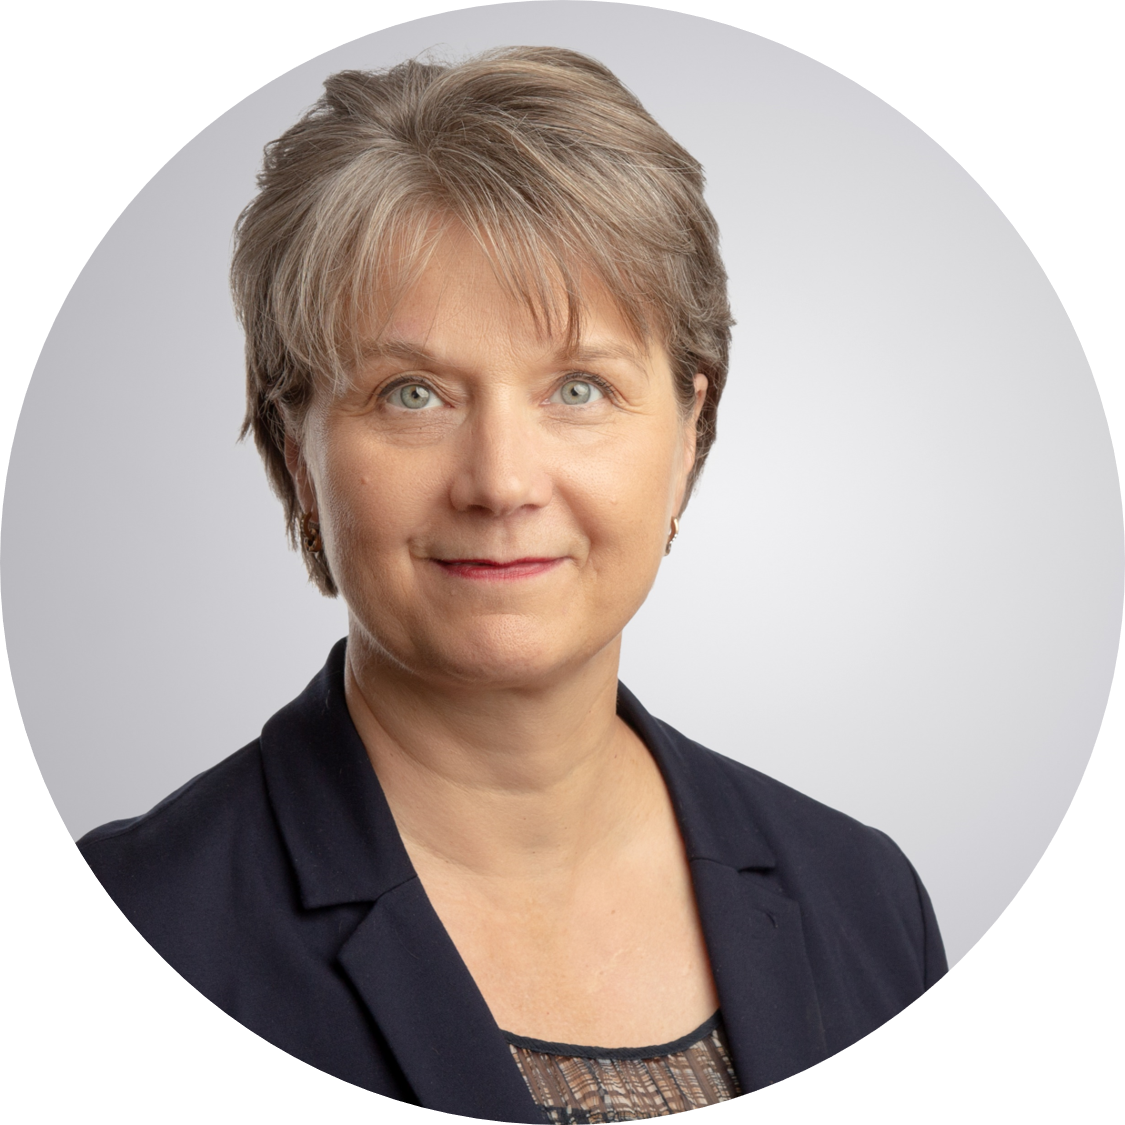 Helena Niemelä